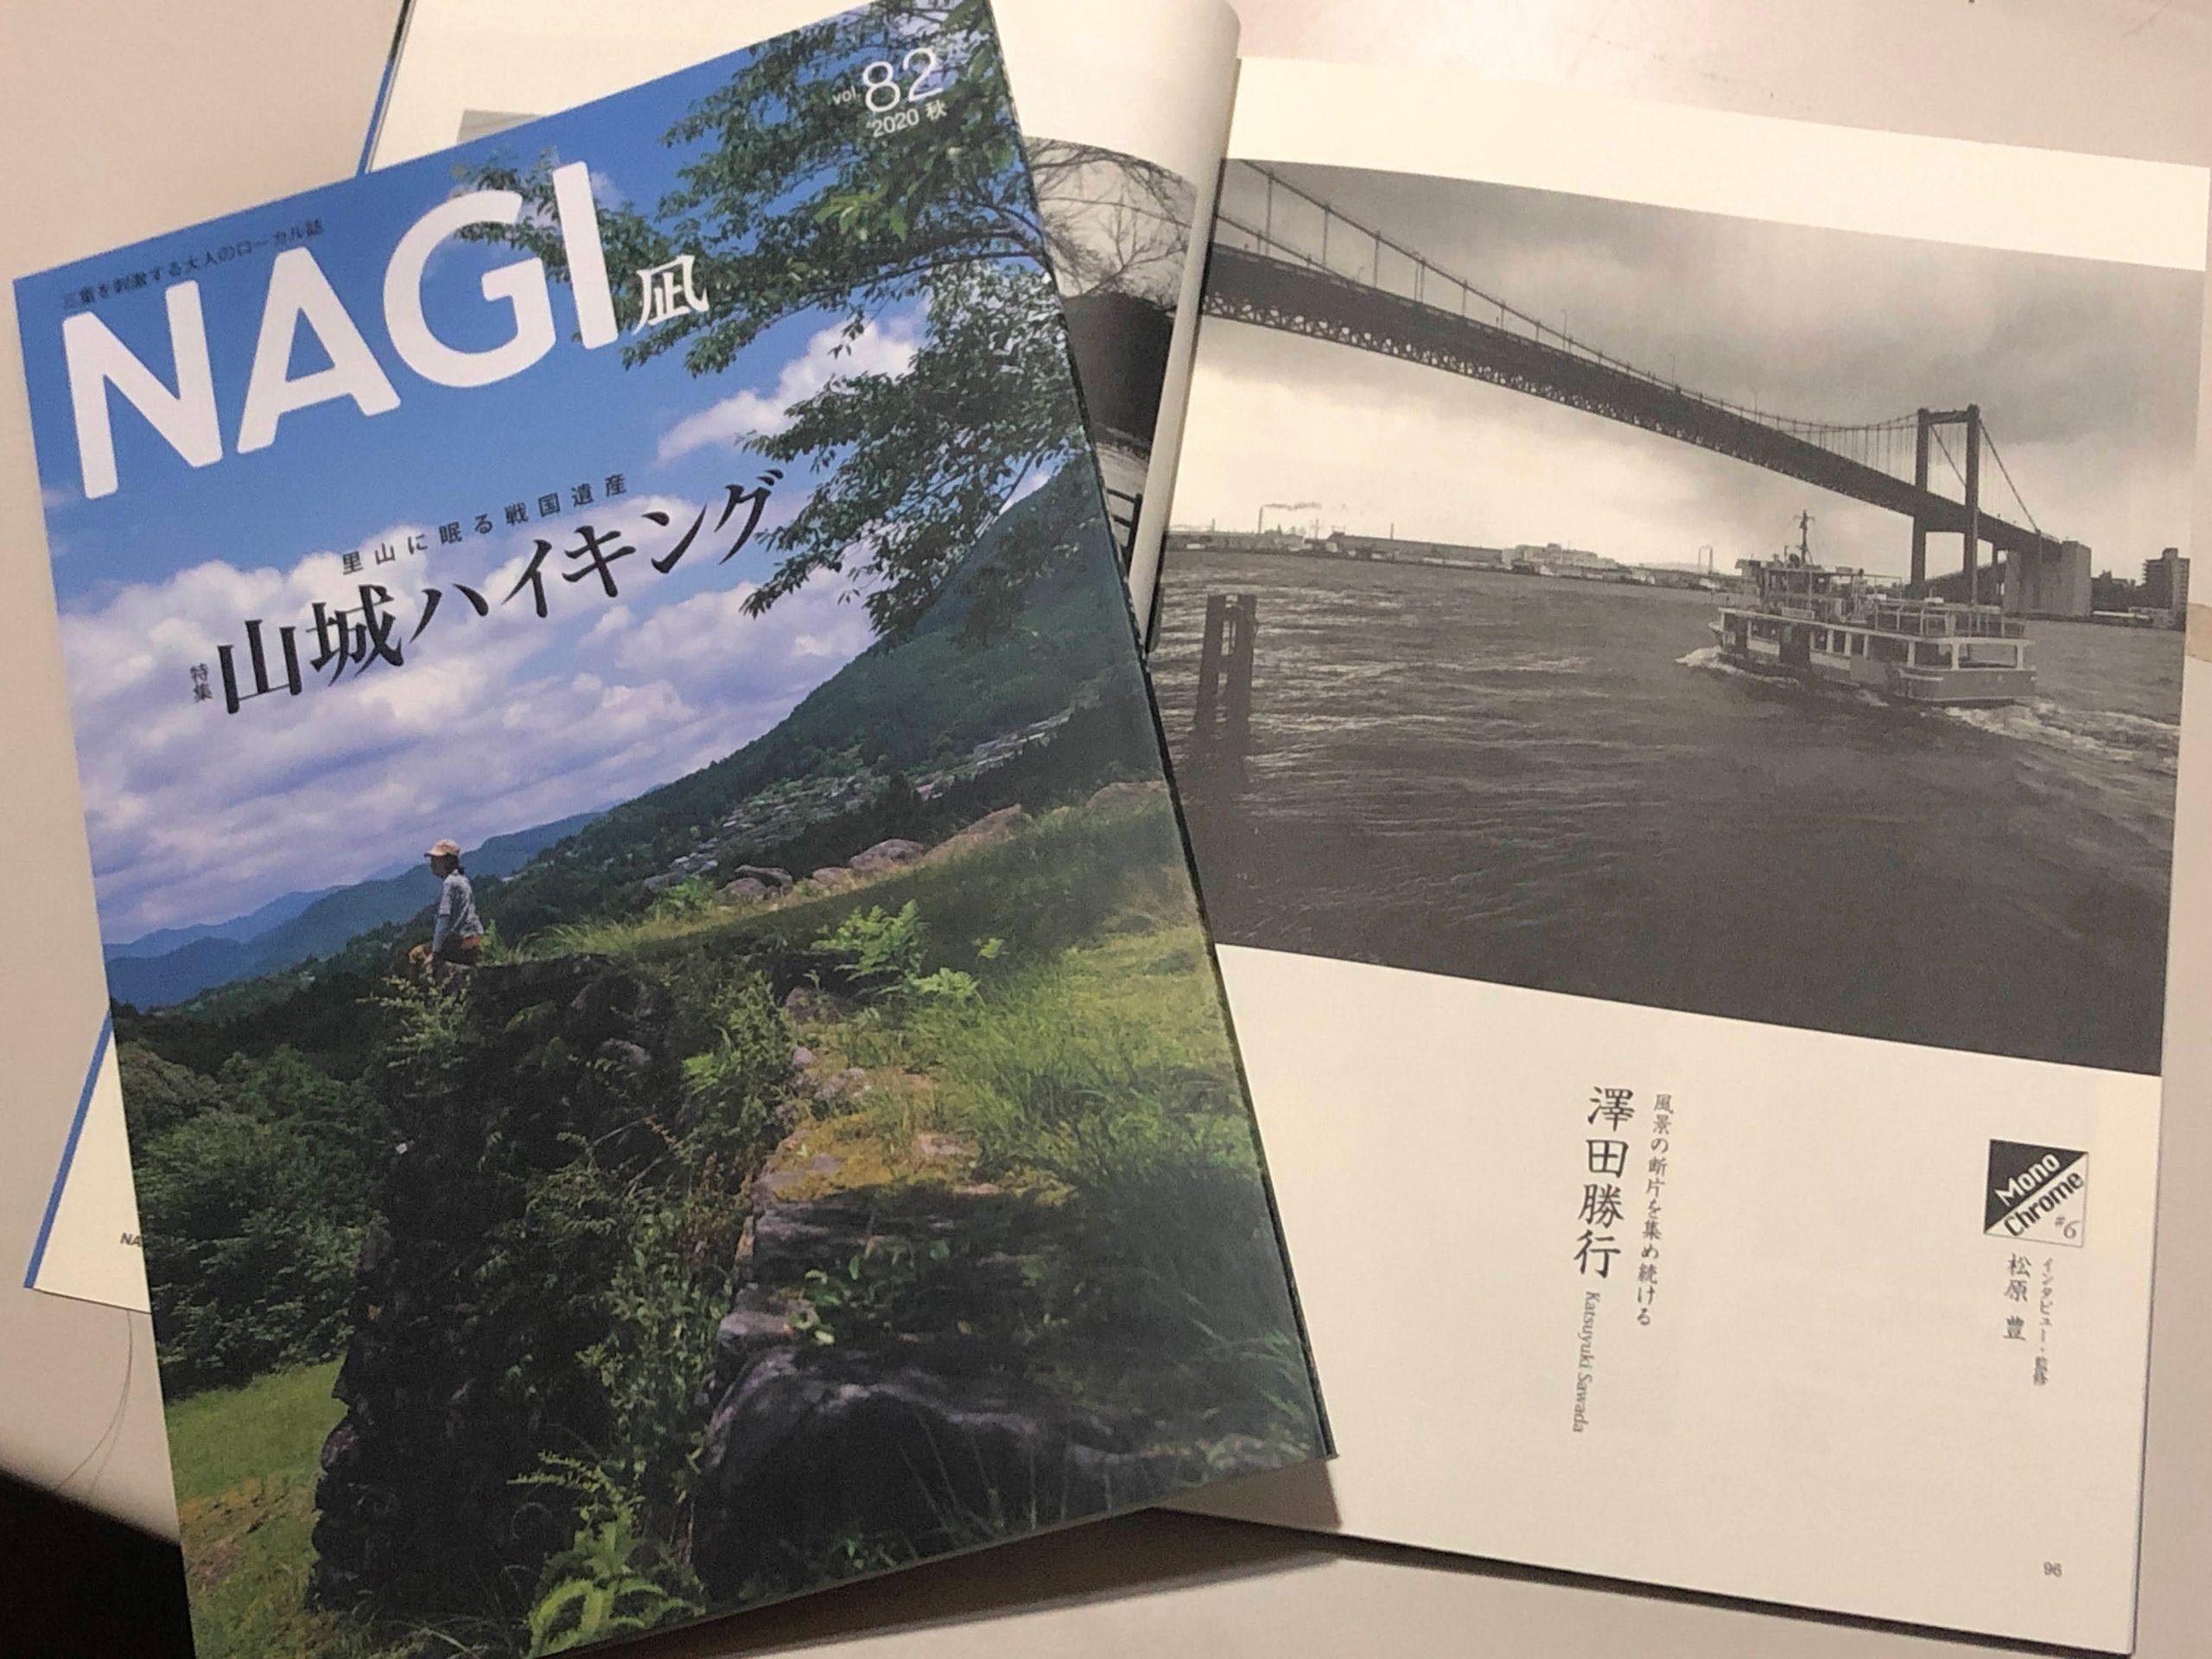 200905NAGI82号Monochrome澤田勝行